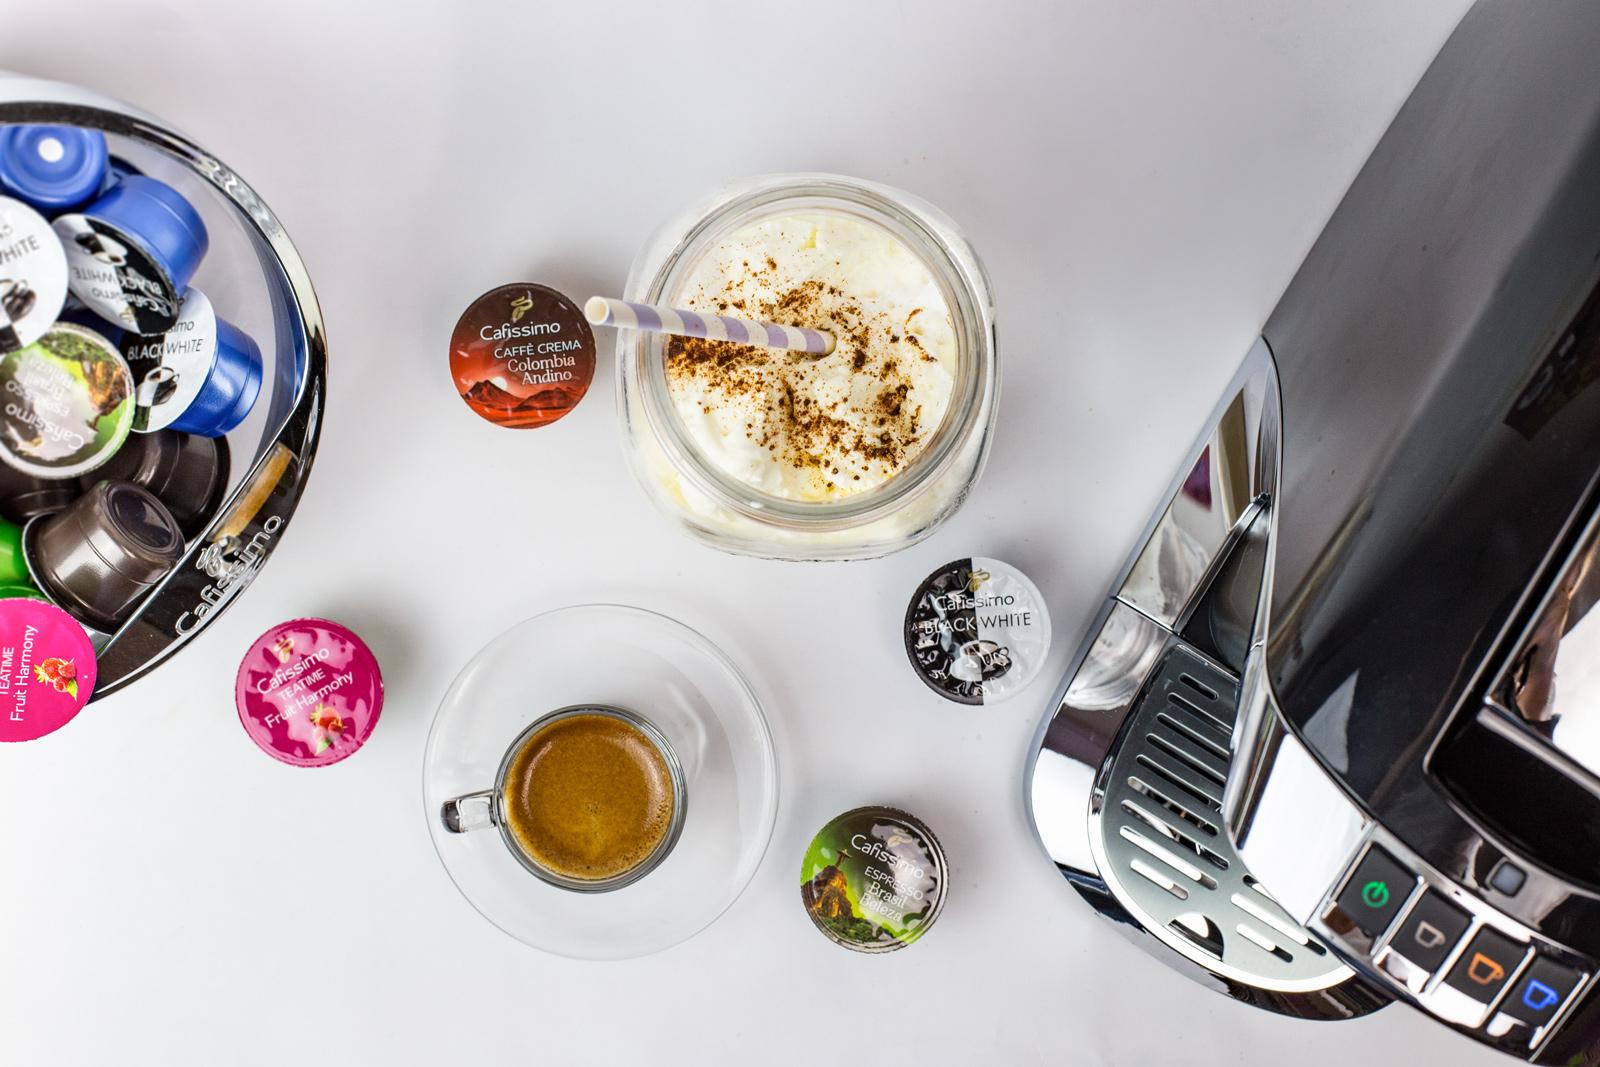 Nadja_Nemetz_Rezept_iced_caffe_latte_vanille_eis_vanilleeis_tchibo_eduscho_2